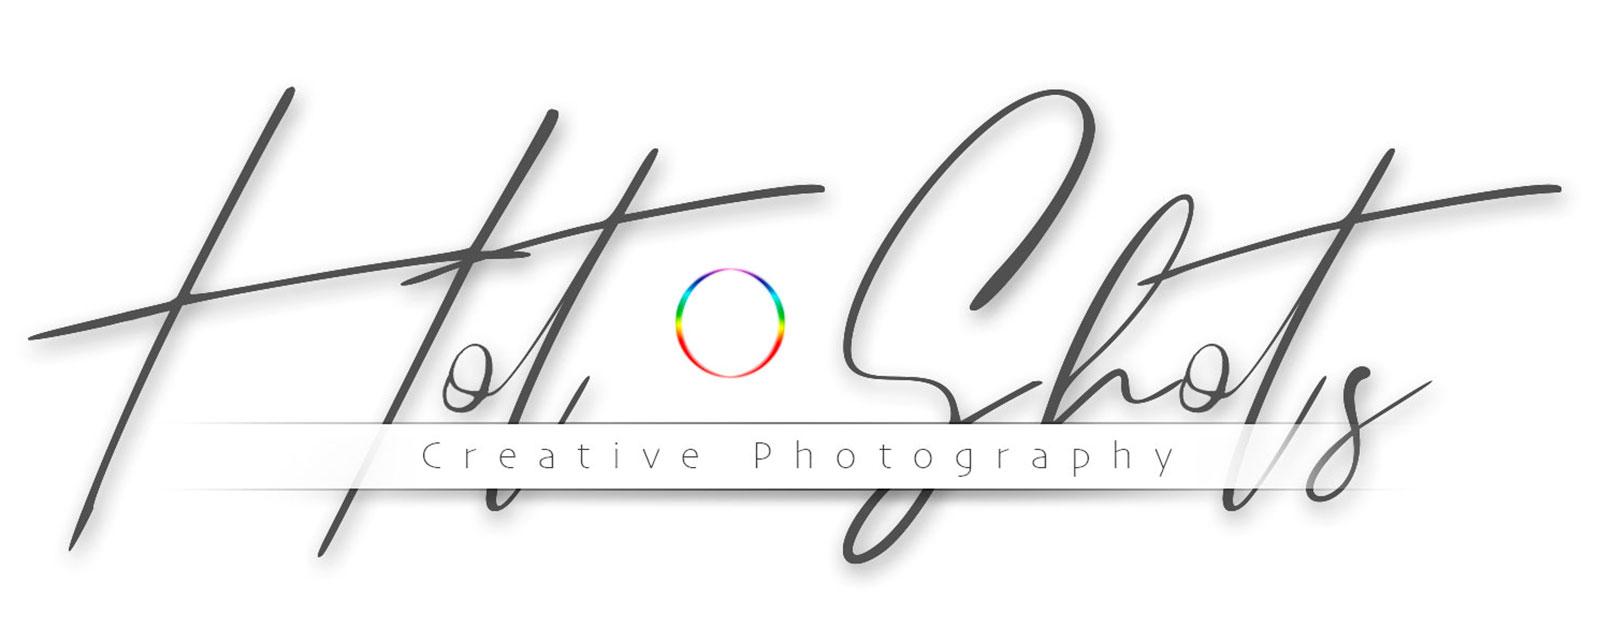 wedding portrait commercial photographers Hotshots Creative Photography Logotype